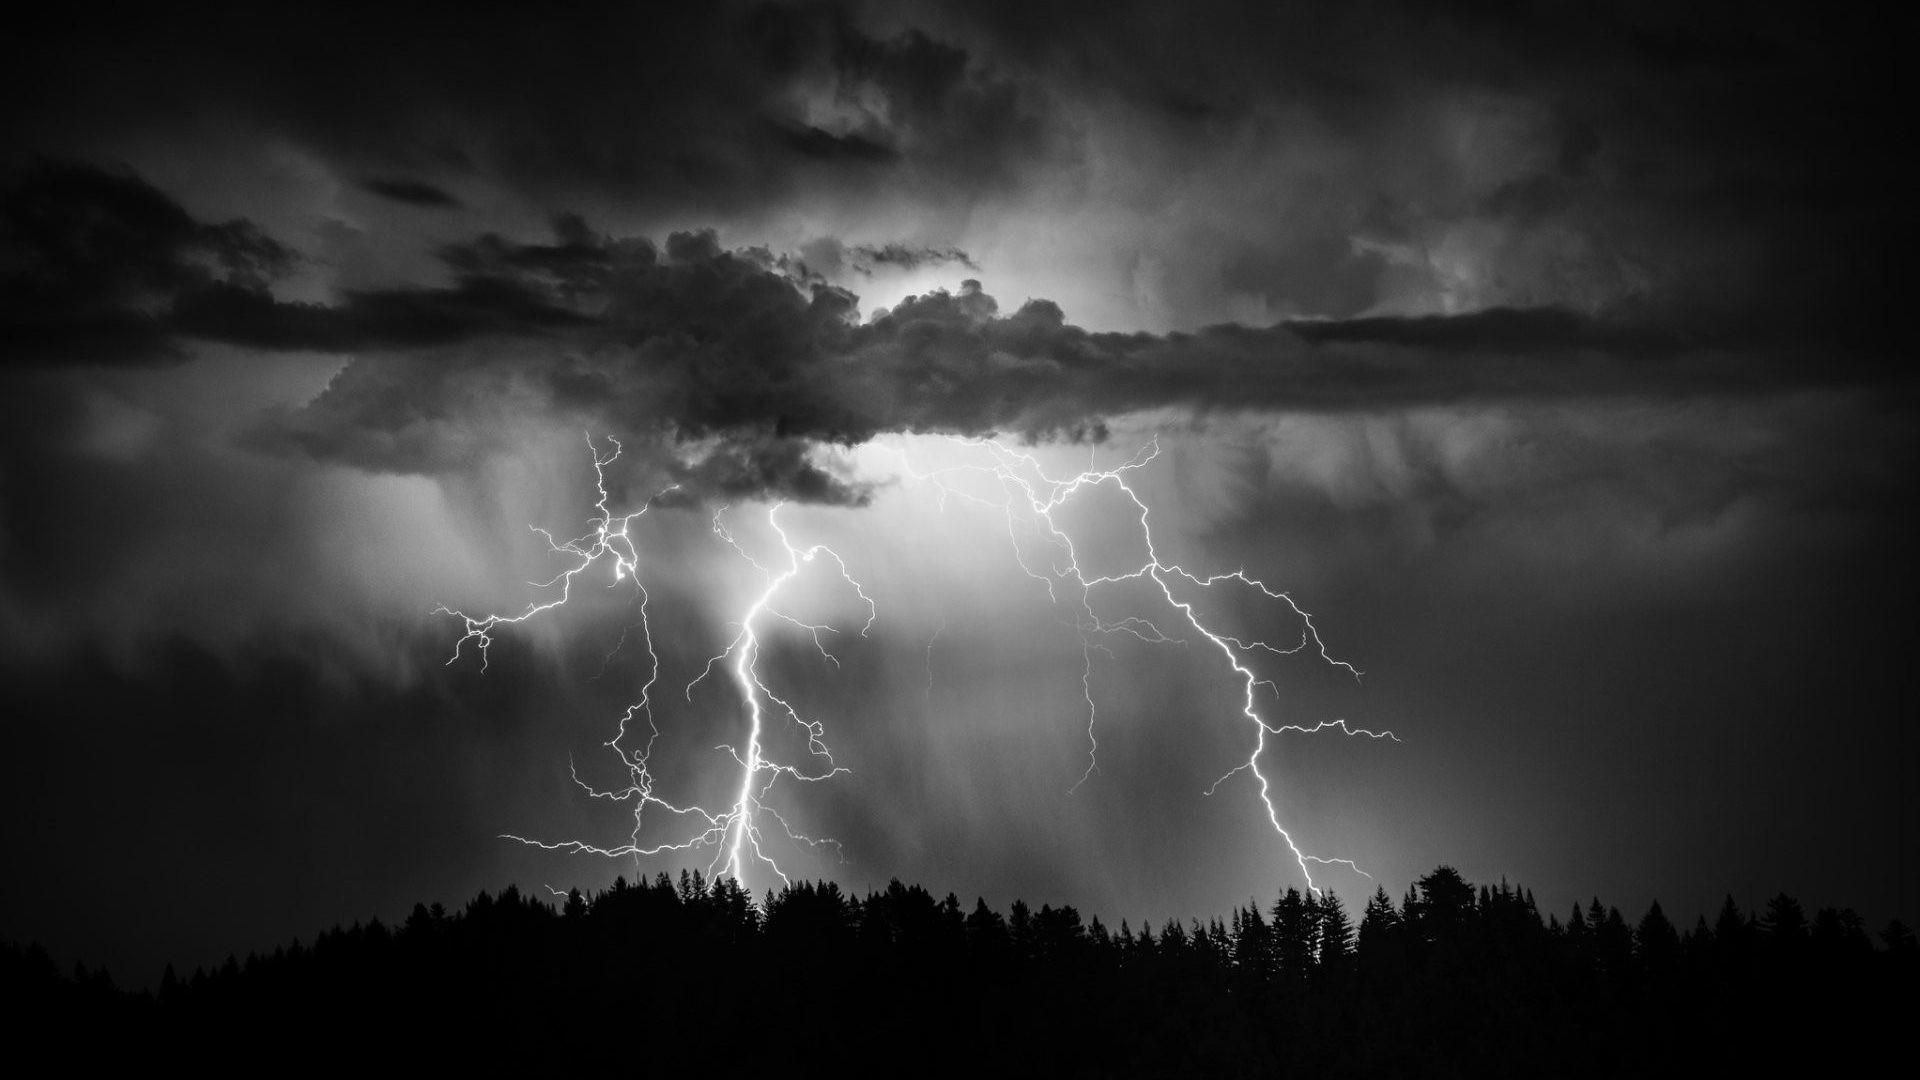 thunderstorm desktop wallpaper 61 images